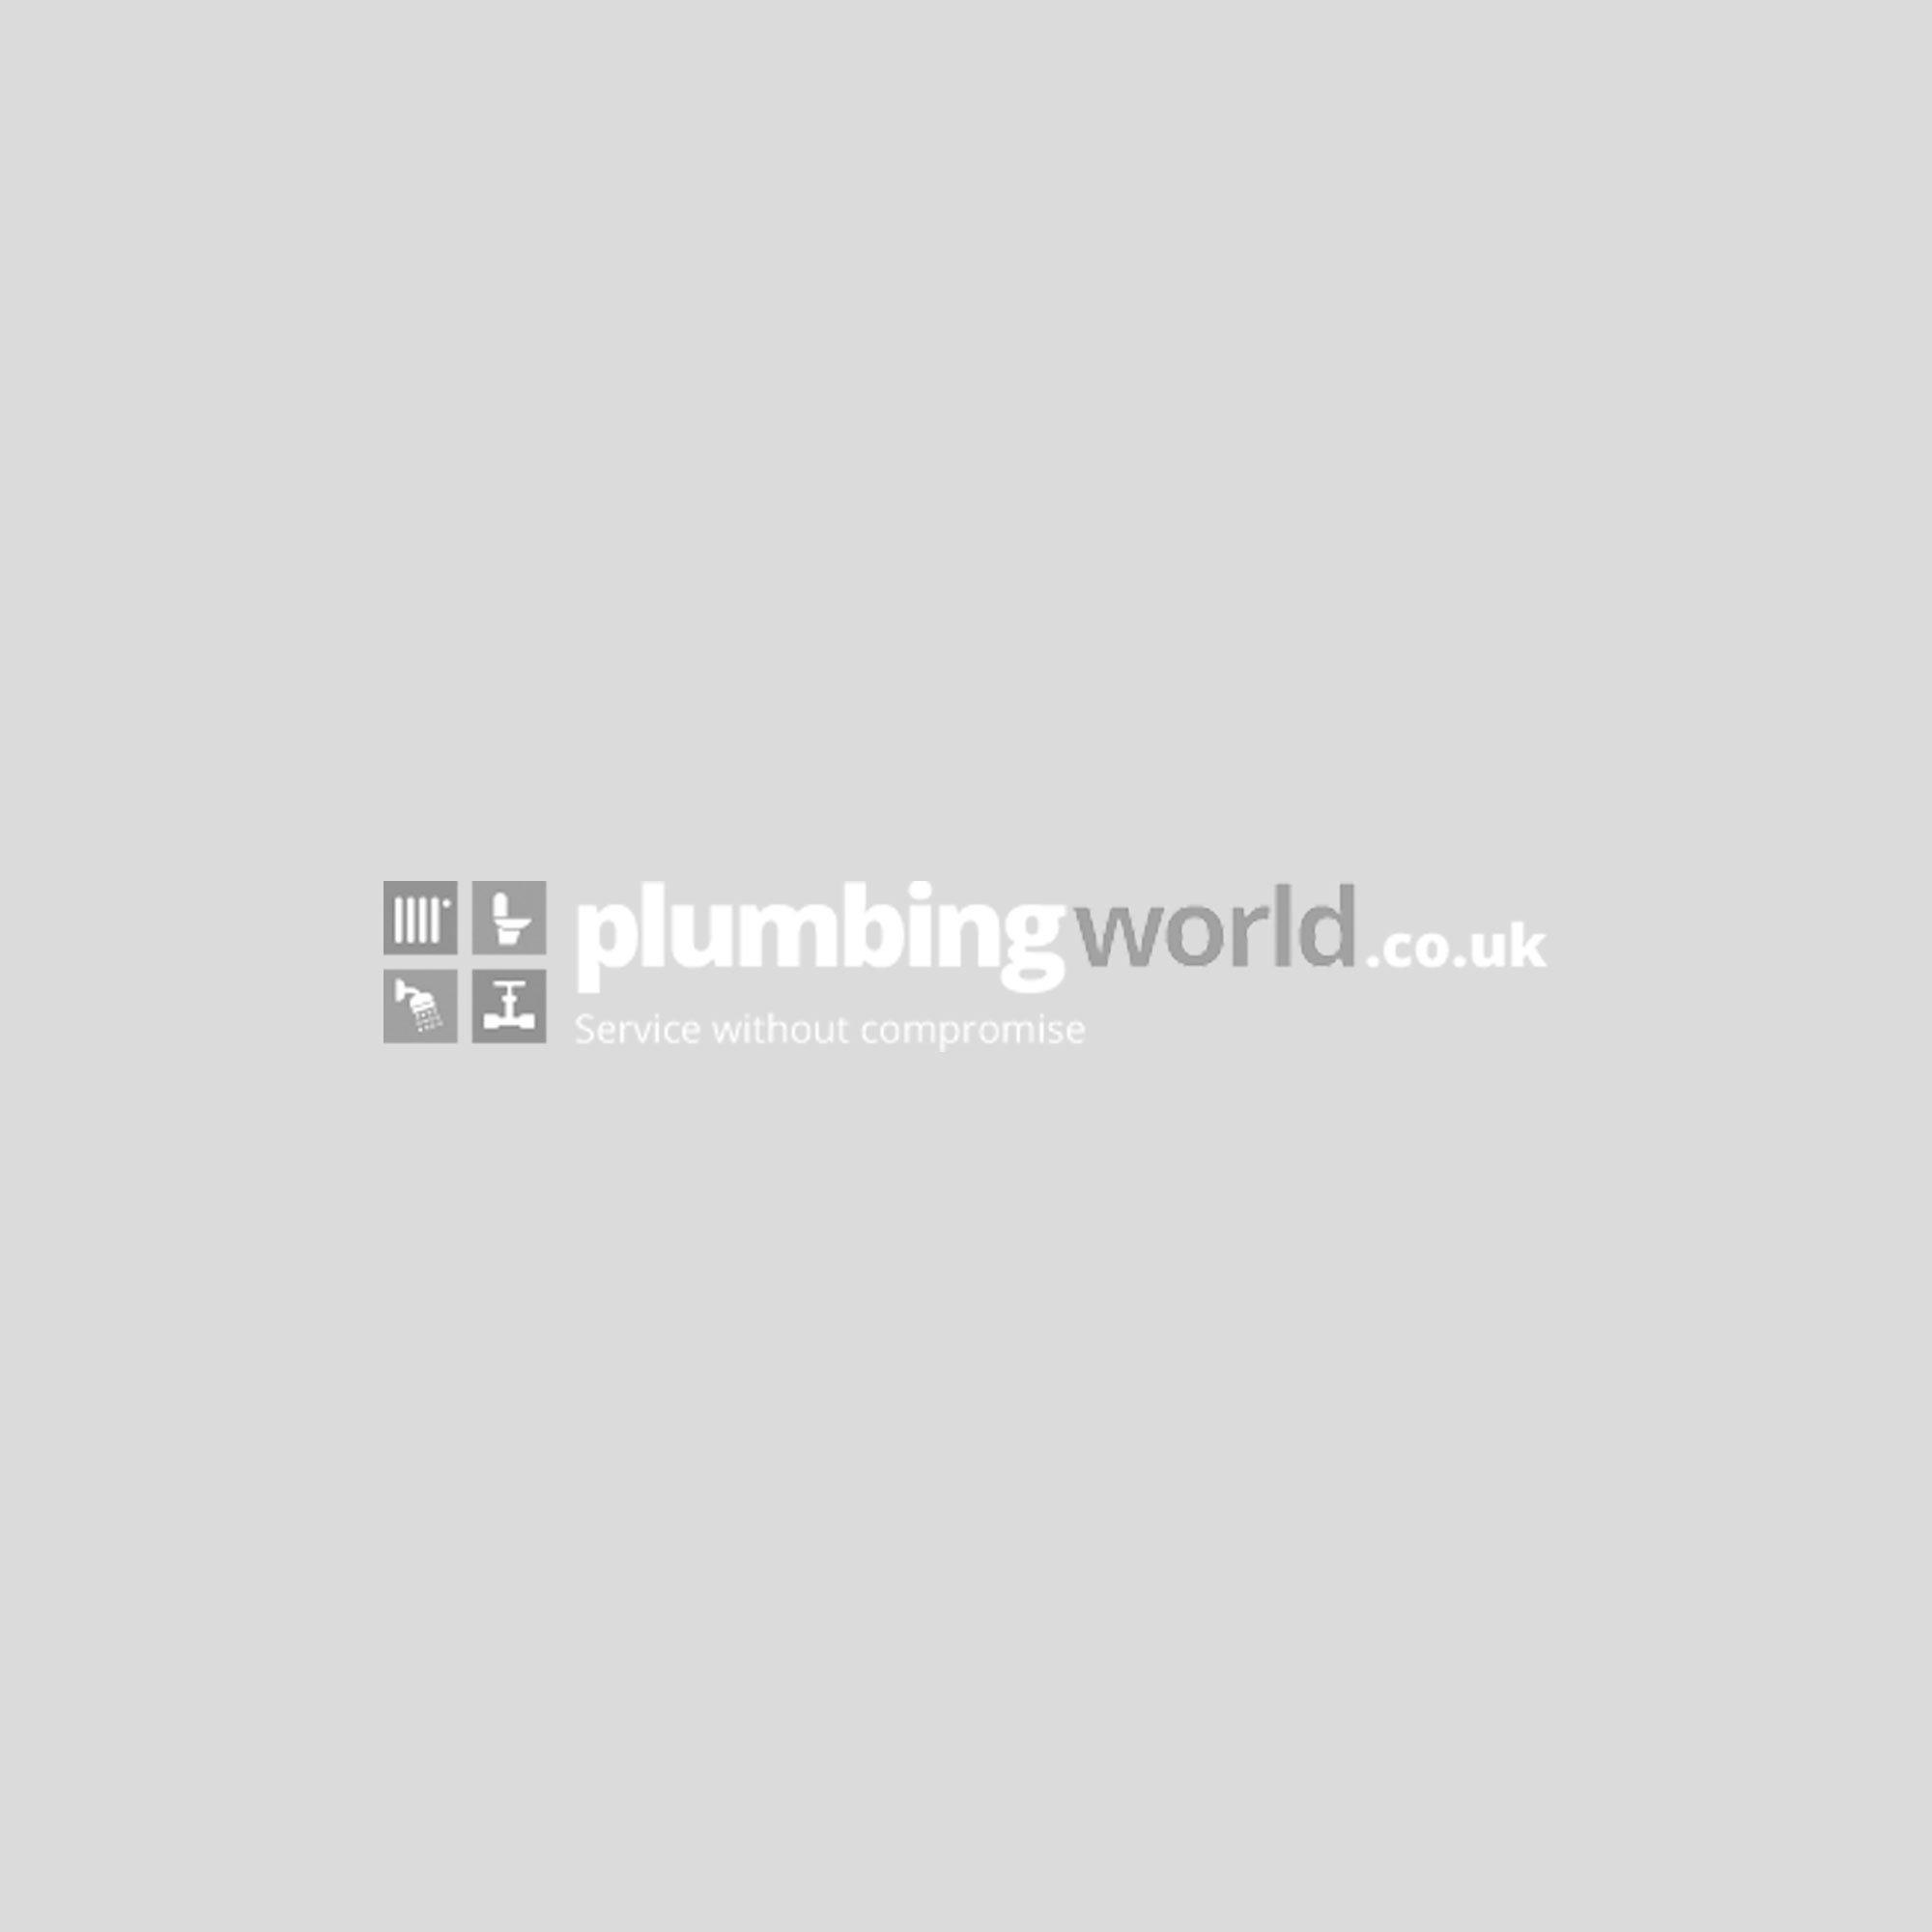 1200mm wide x 2400mm High x 10mm Depth PVC Shower Panel - Silver Travertine Matt